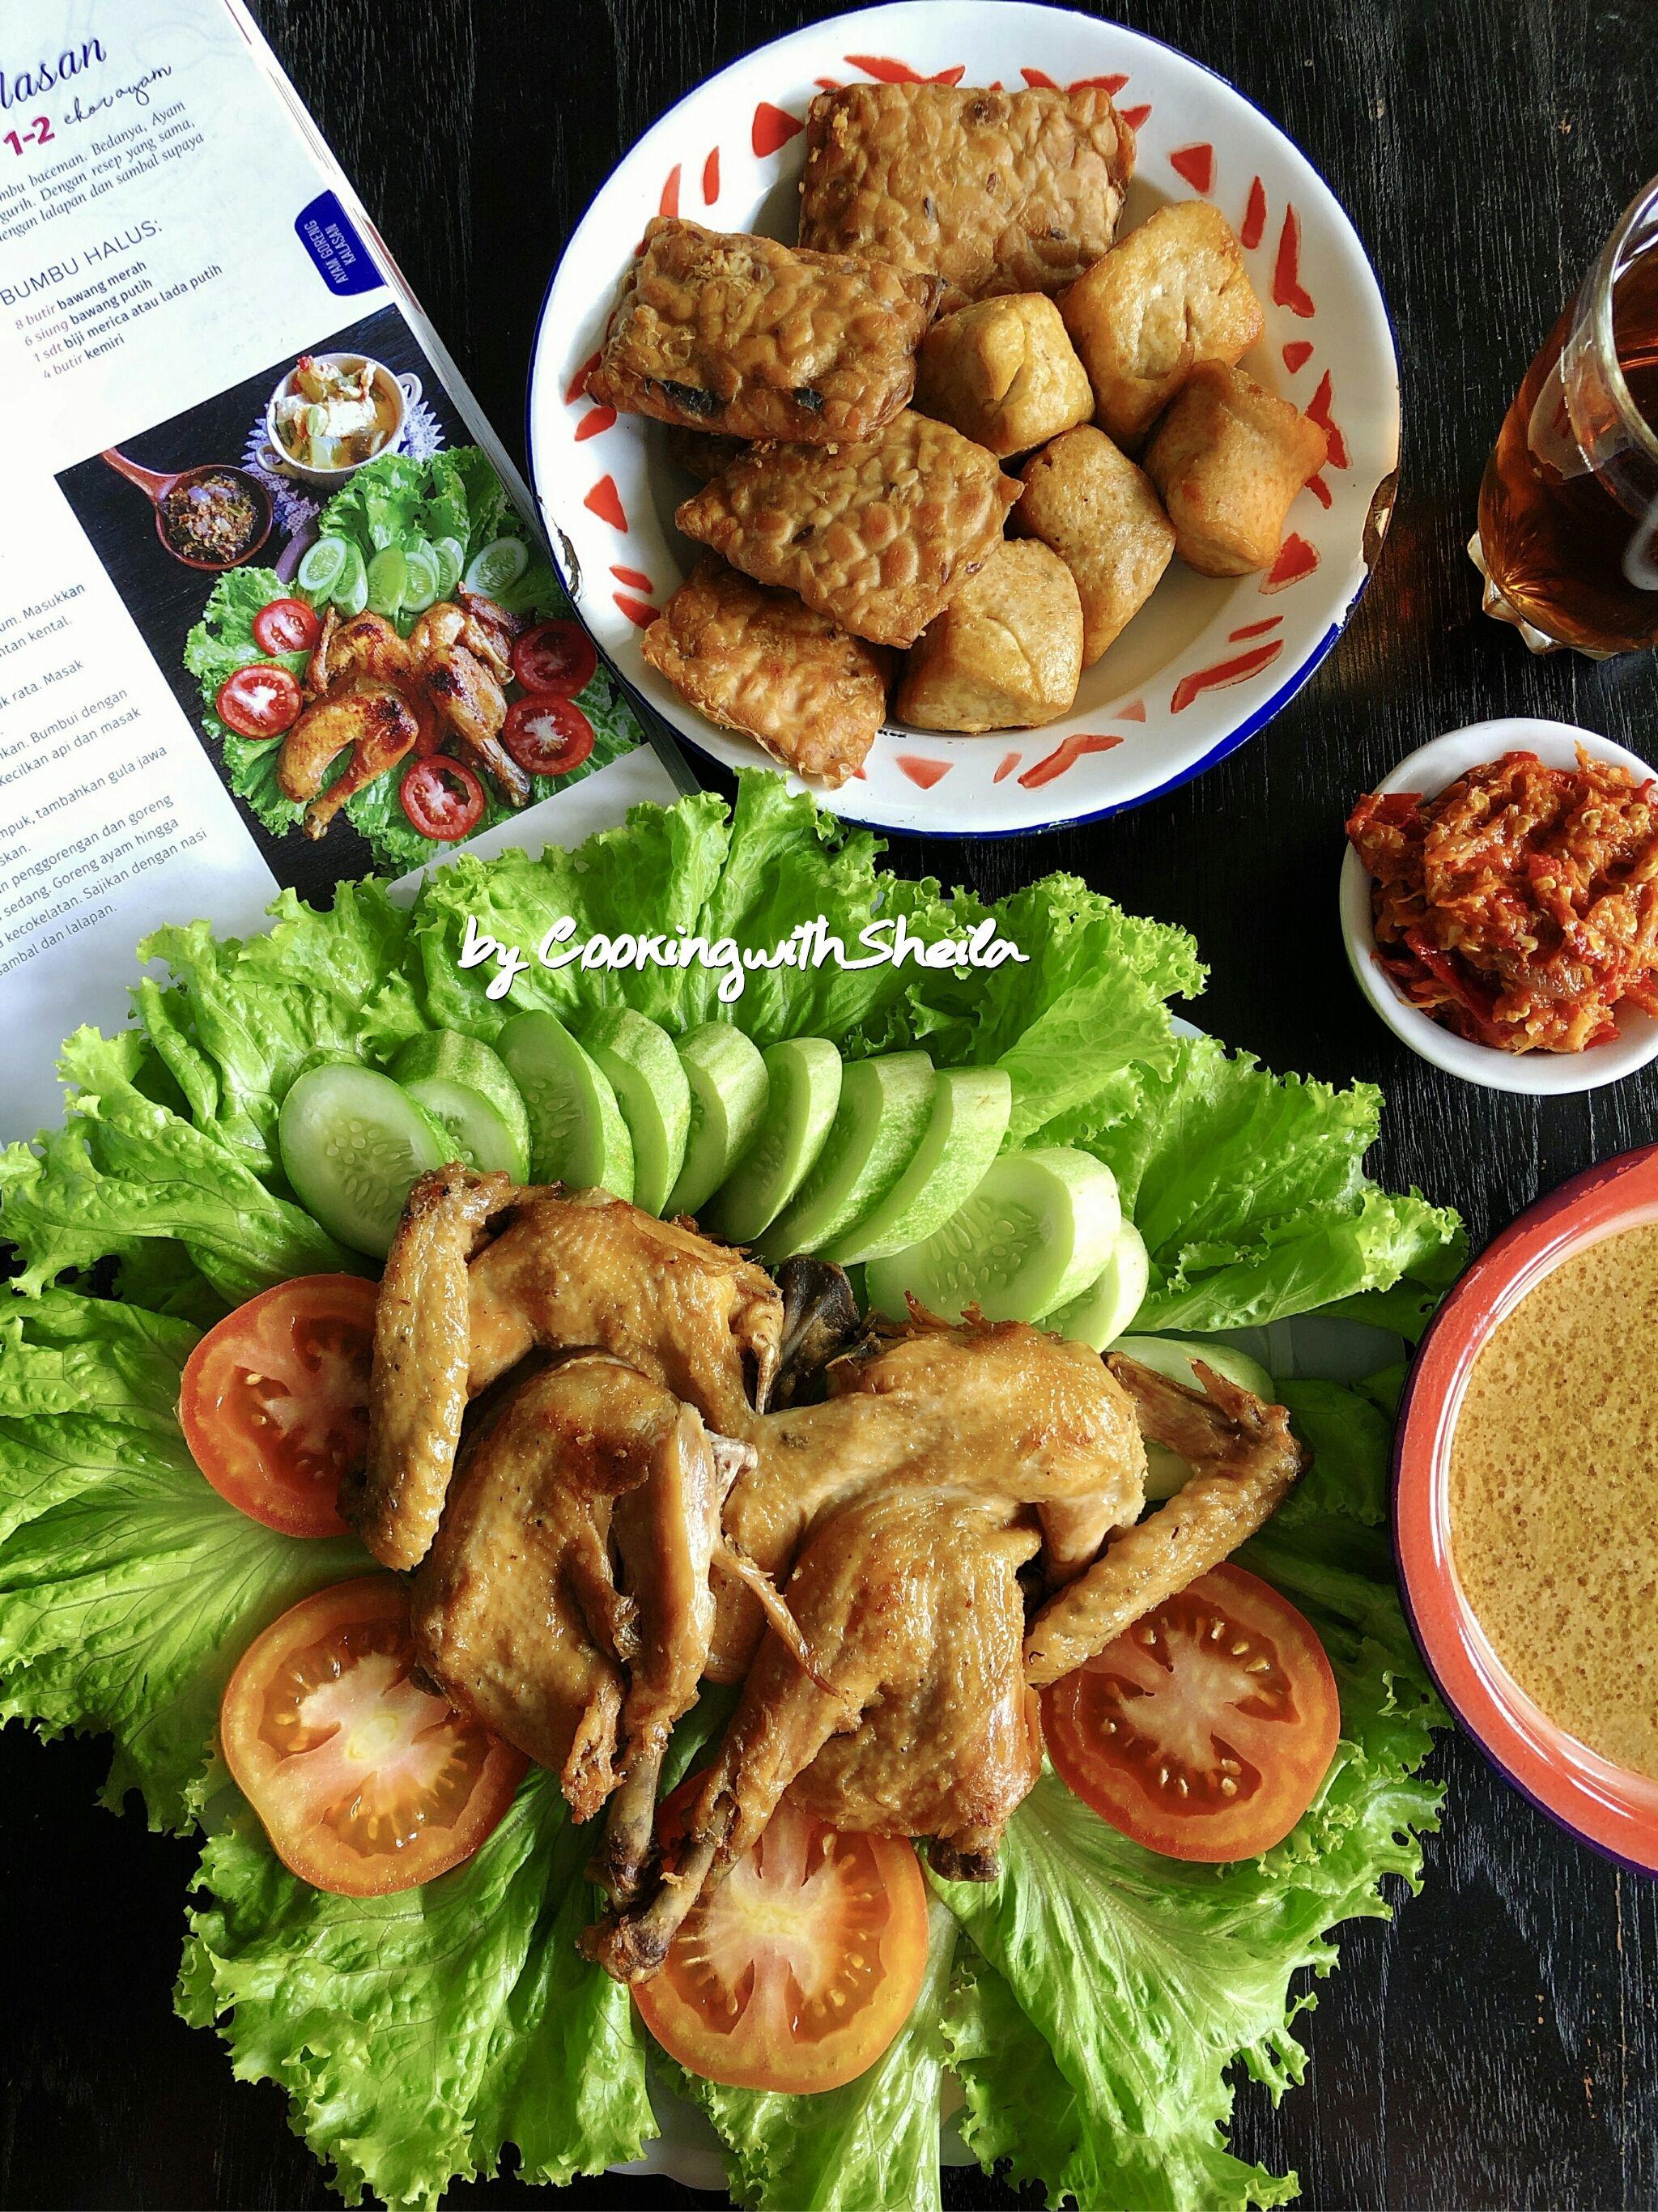 Ayam Lalapan Png : lalapan, Gambar, Makanan, Lalapan, Harga, Delivery, Lengkap